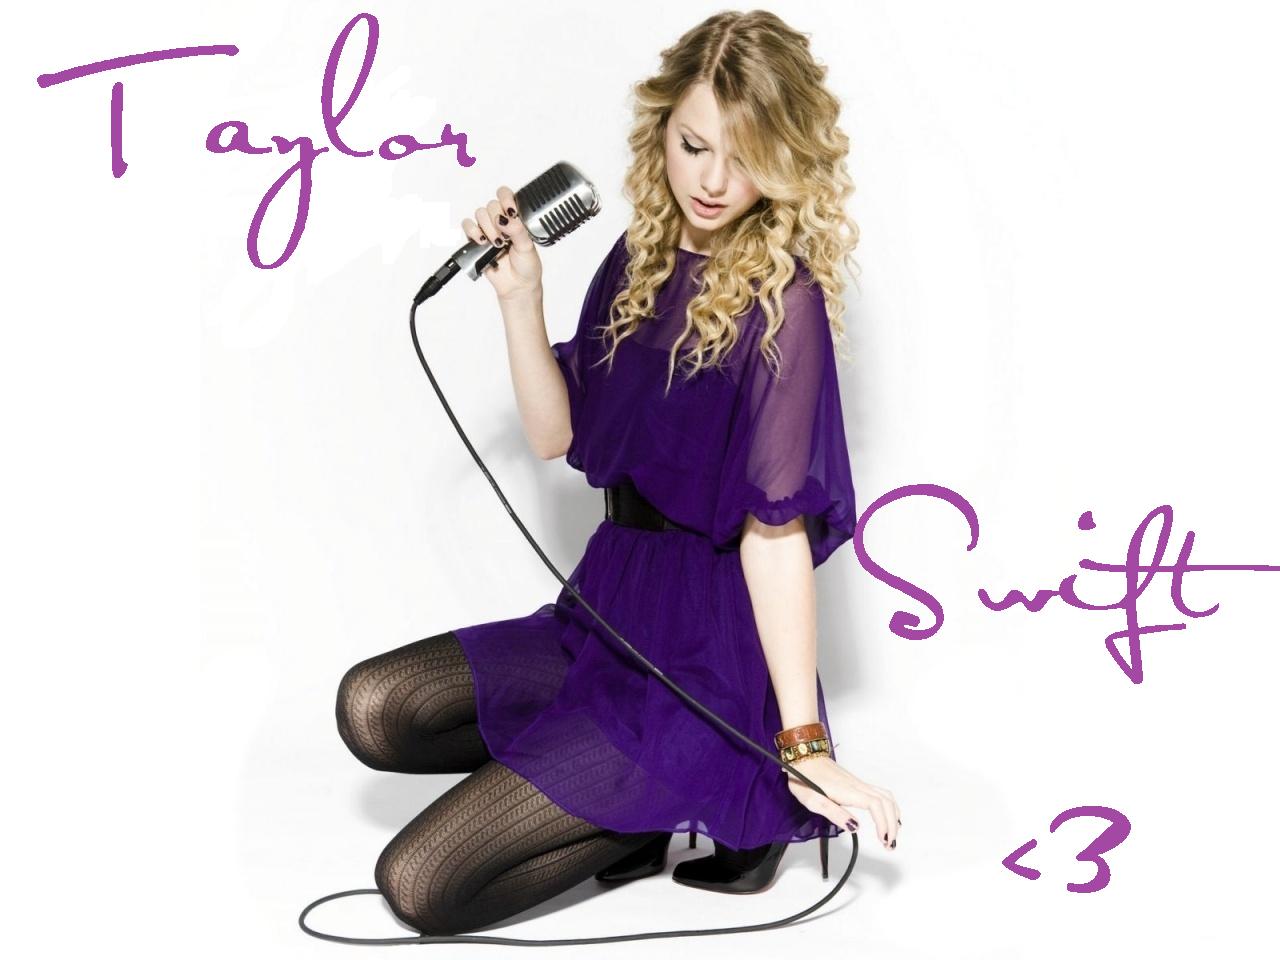 http://1.bp.blogspot.com/-jDth48oekbM/TiXsH8bDQRI/AAAAAAAAADw/sT92OP0D0UY/s1600/taylor+purple.png